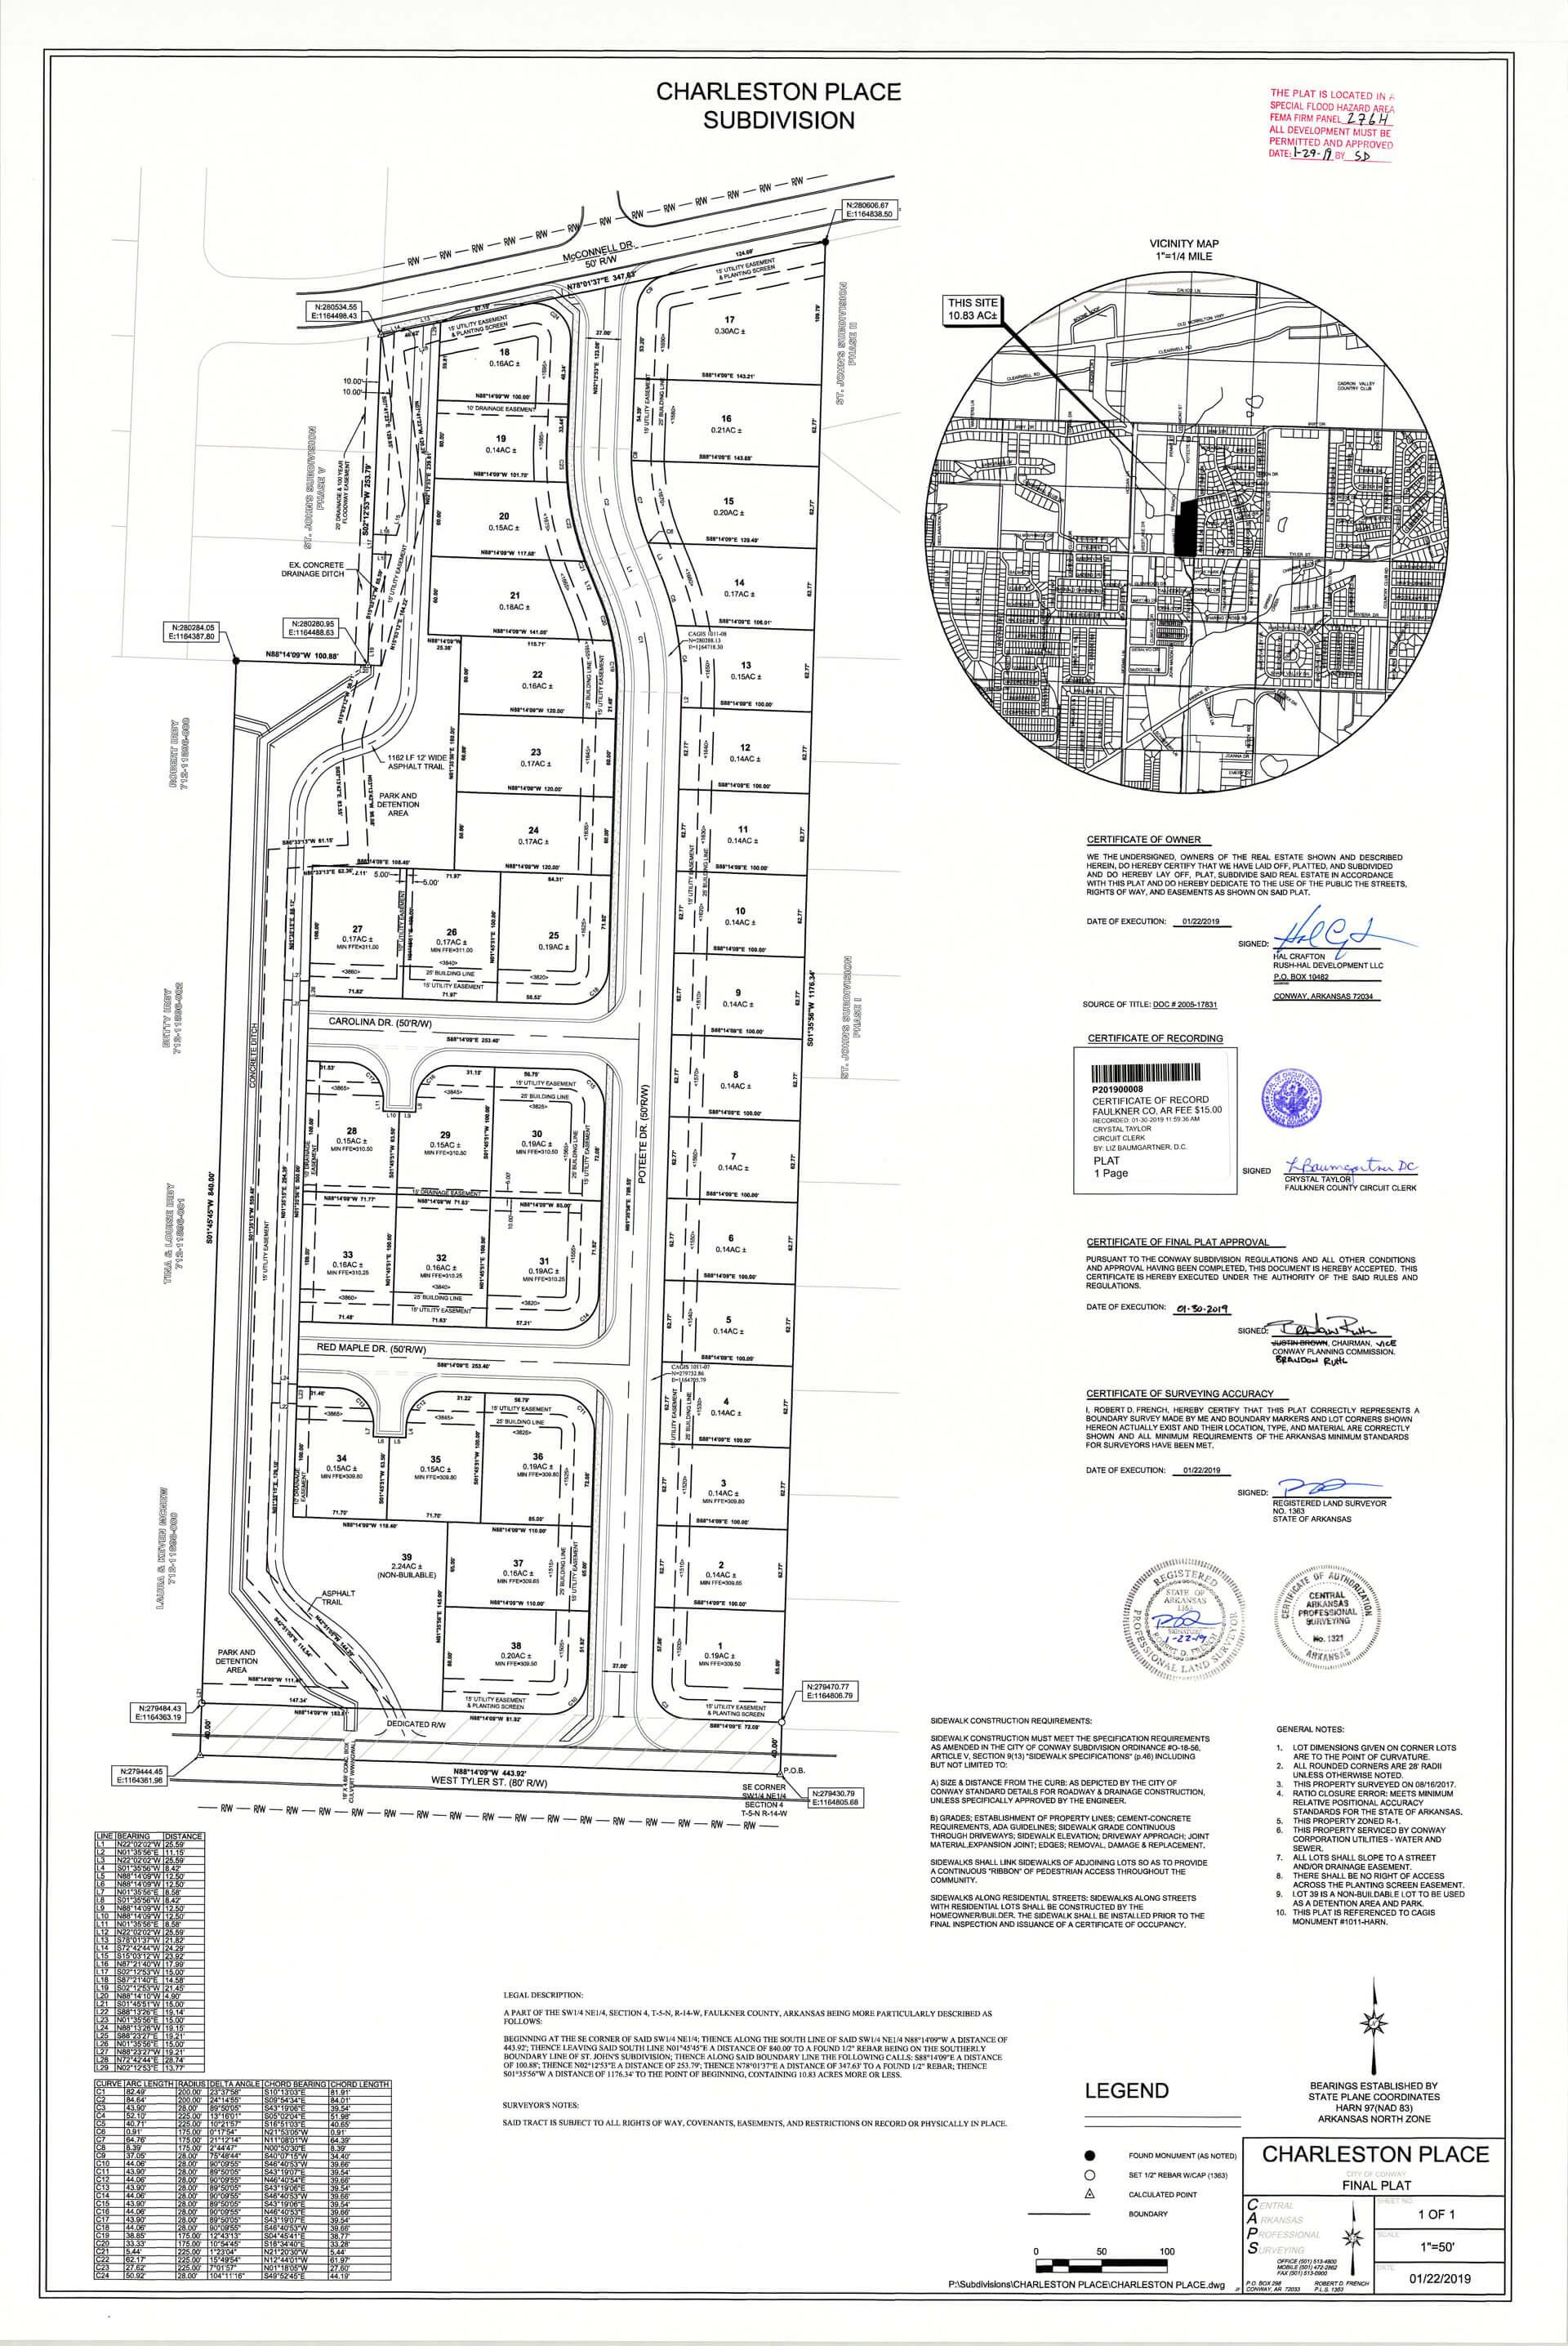 local surveying companies